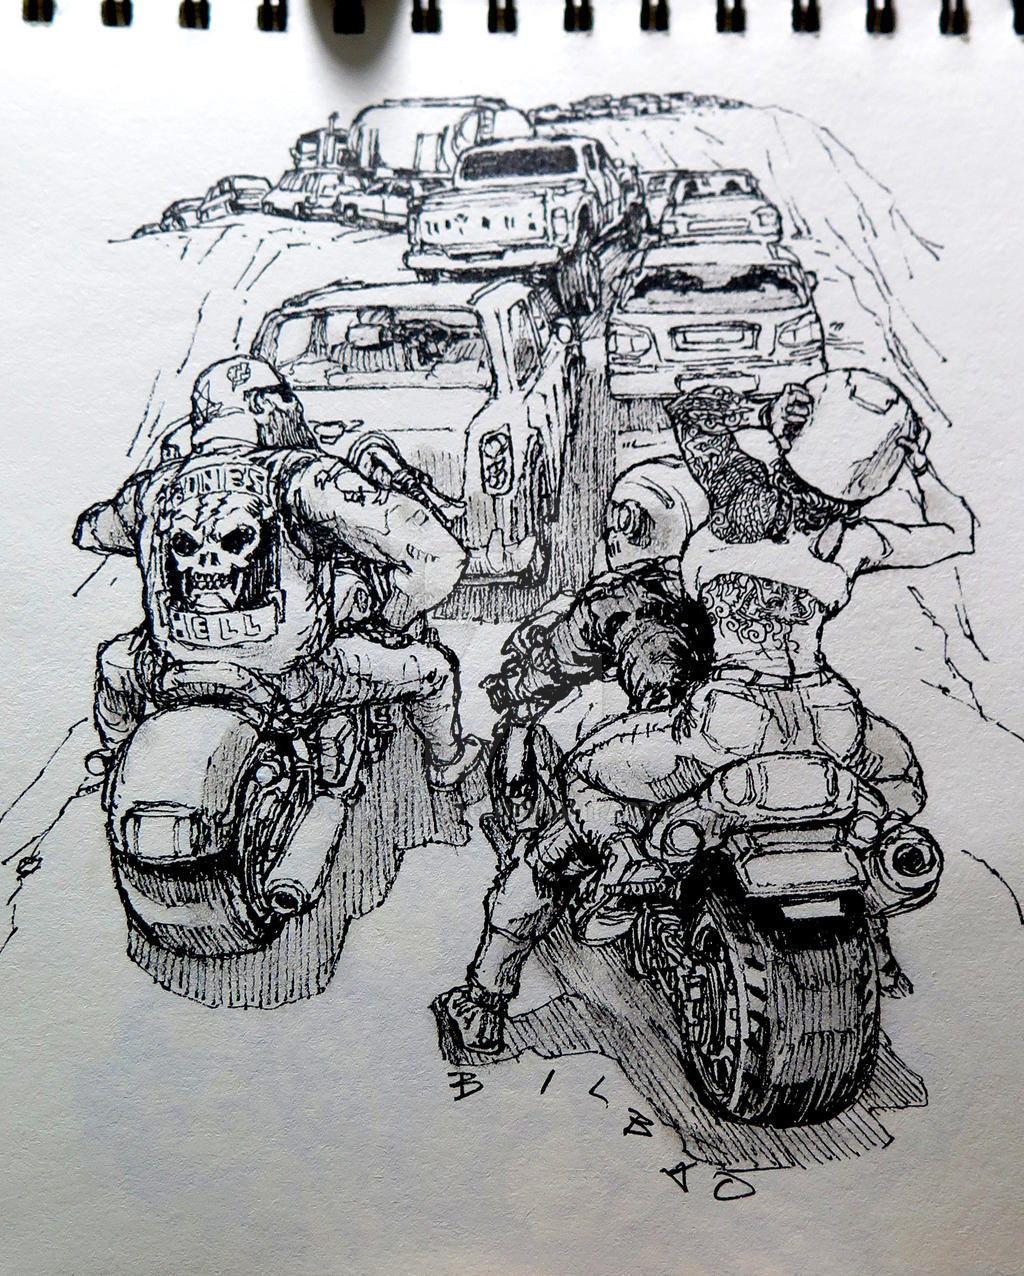 Sketch when bored by jakebilbao